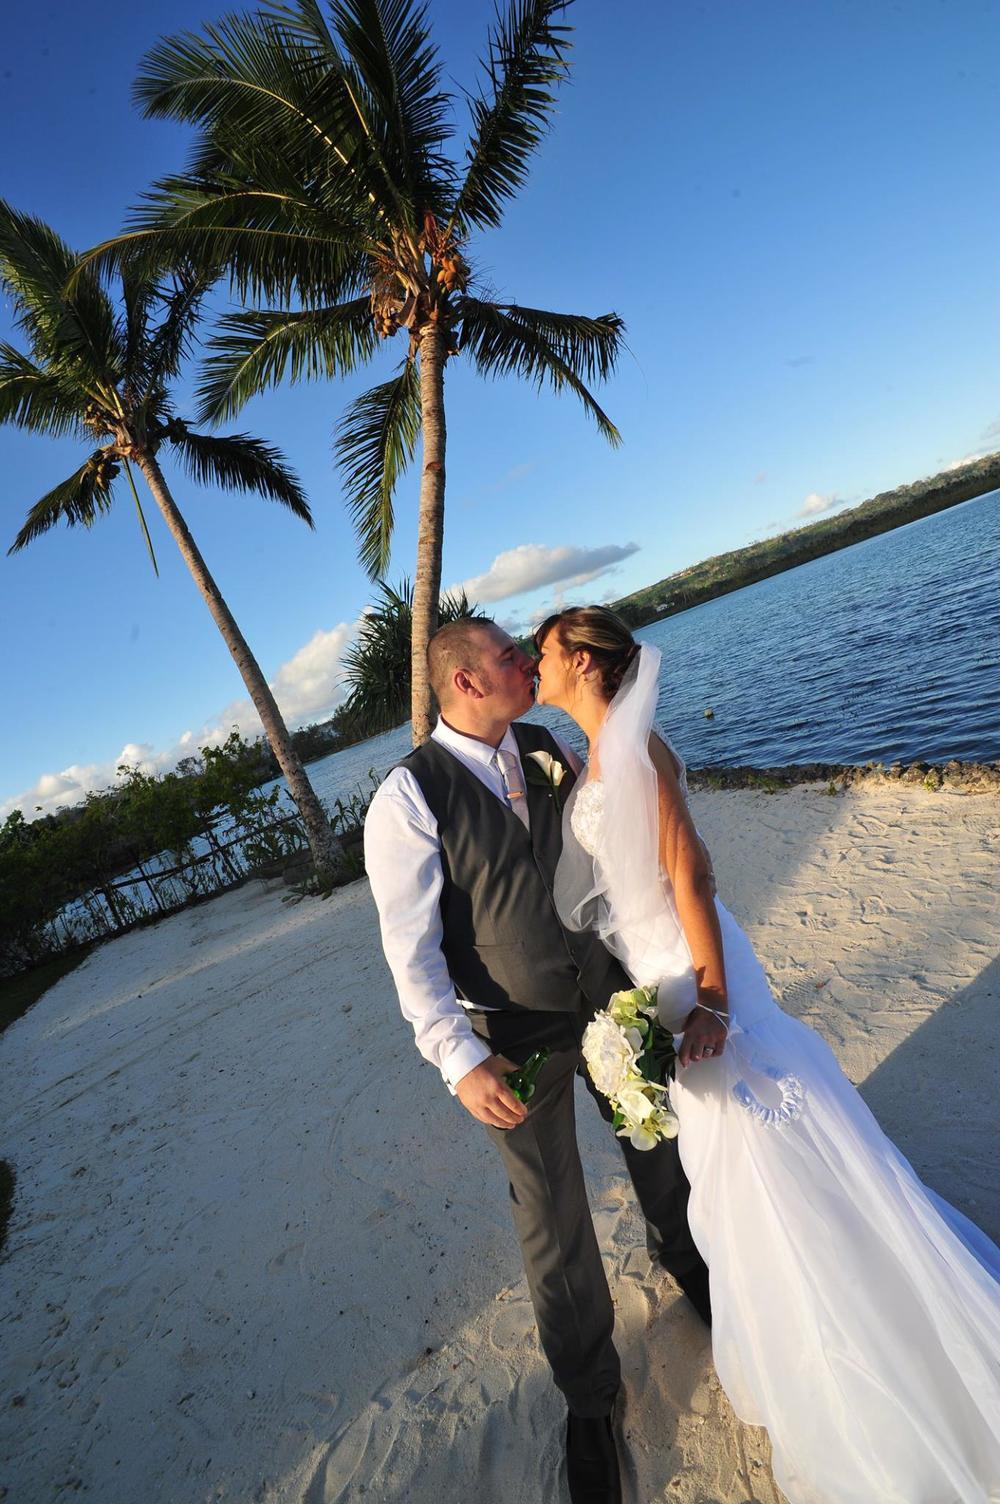 DC - Bride and Groom kiss beachfront.jpg